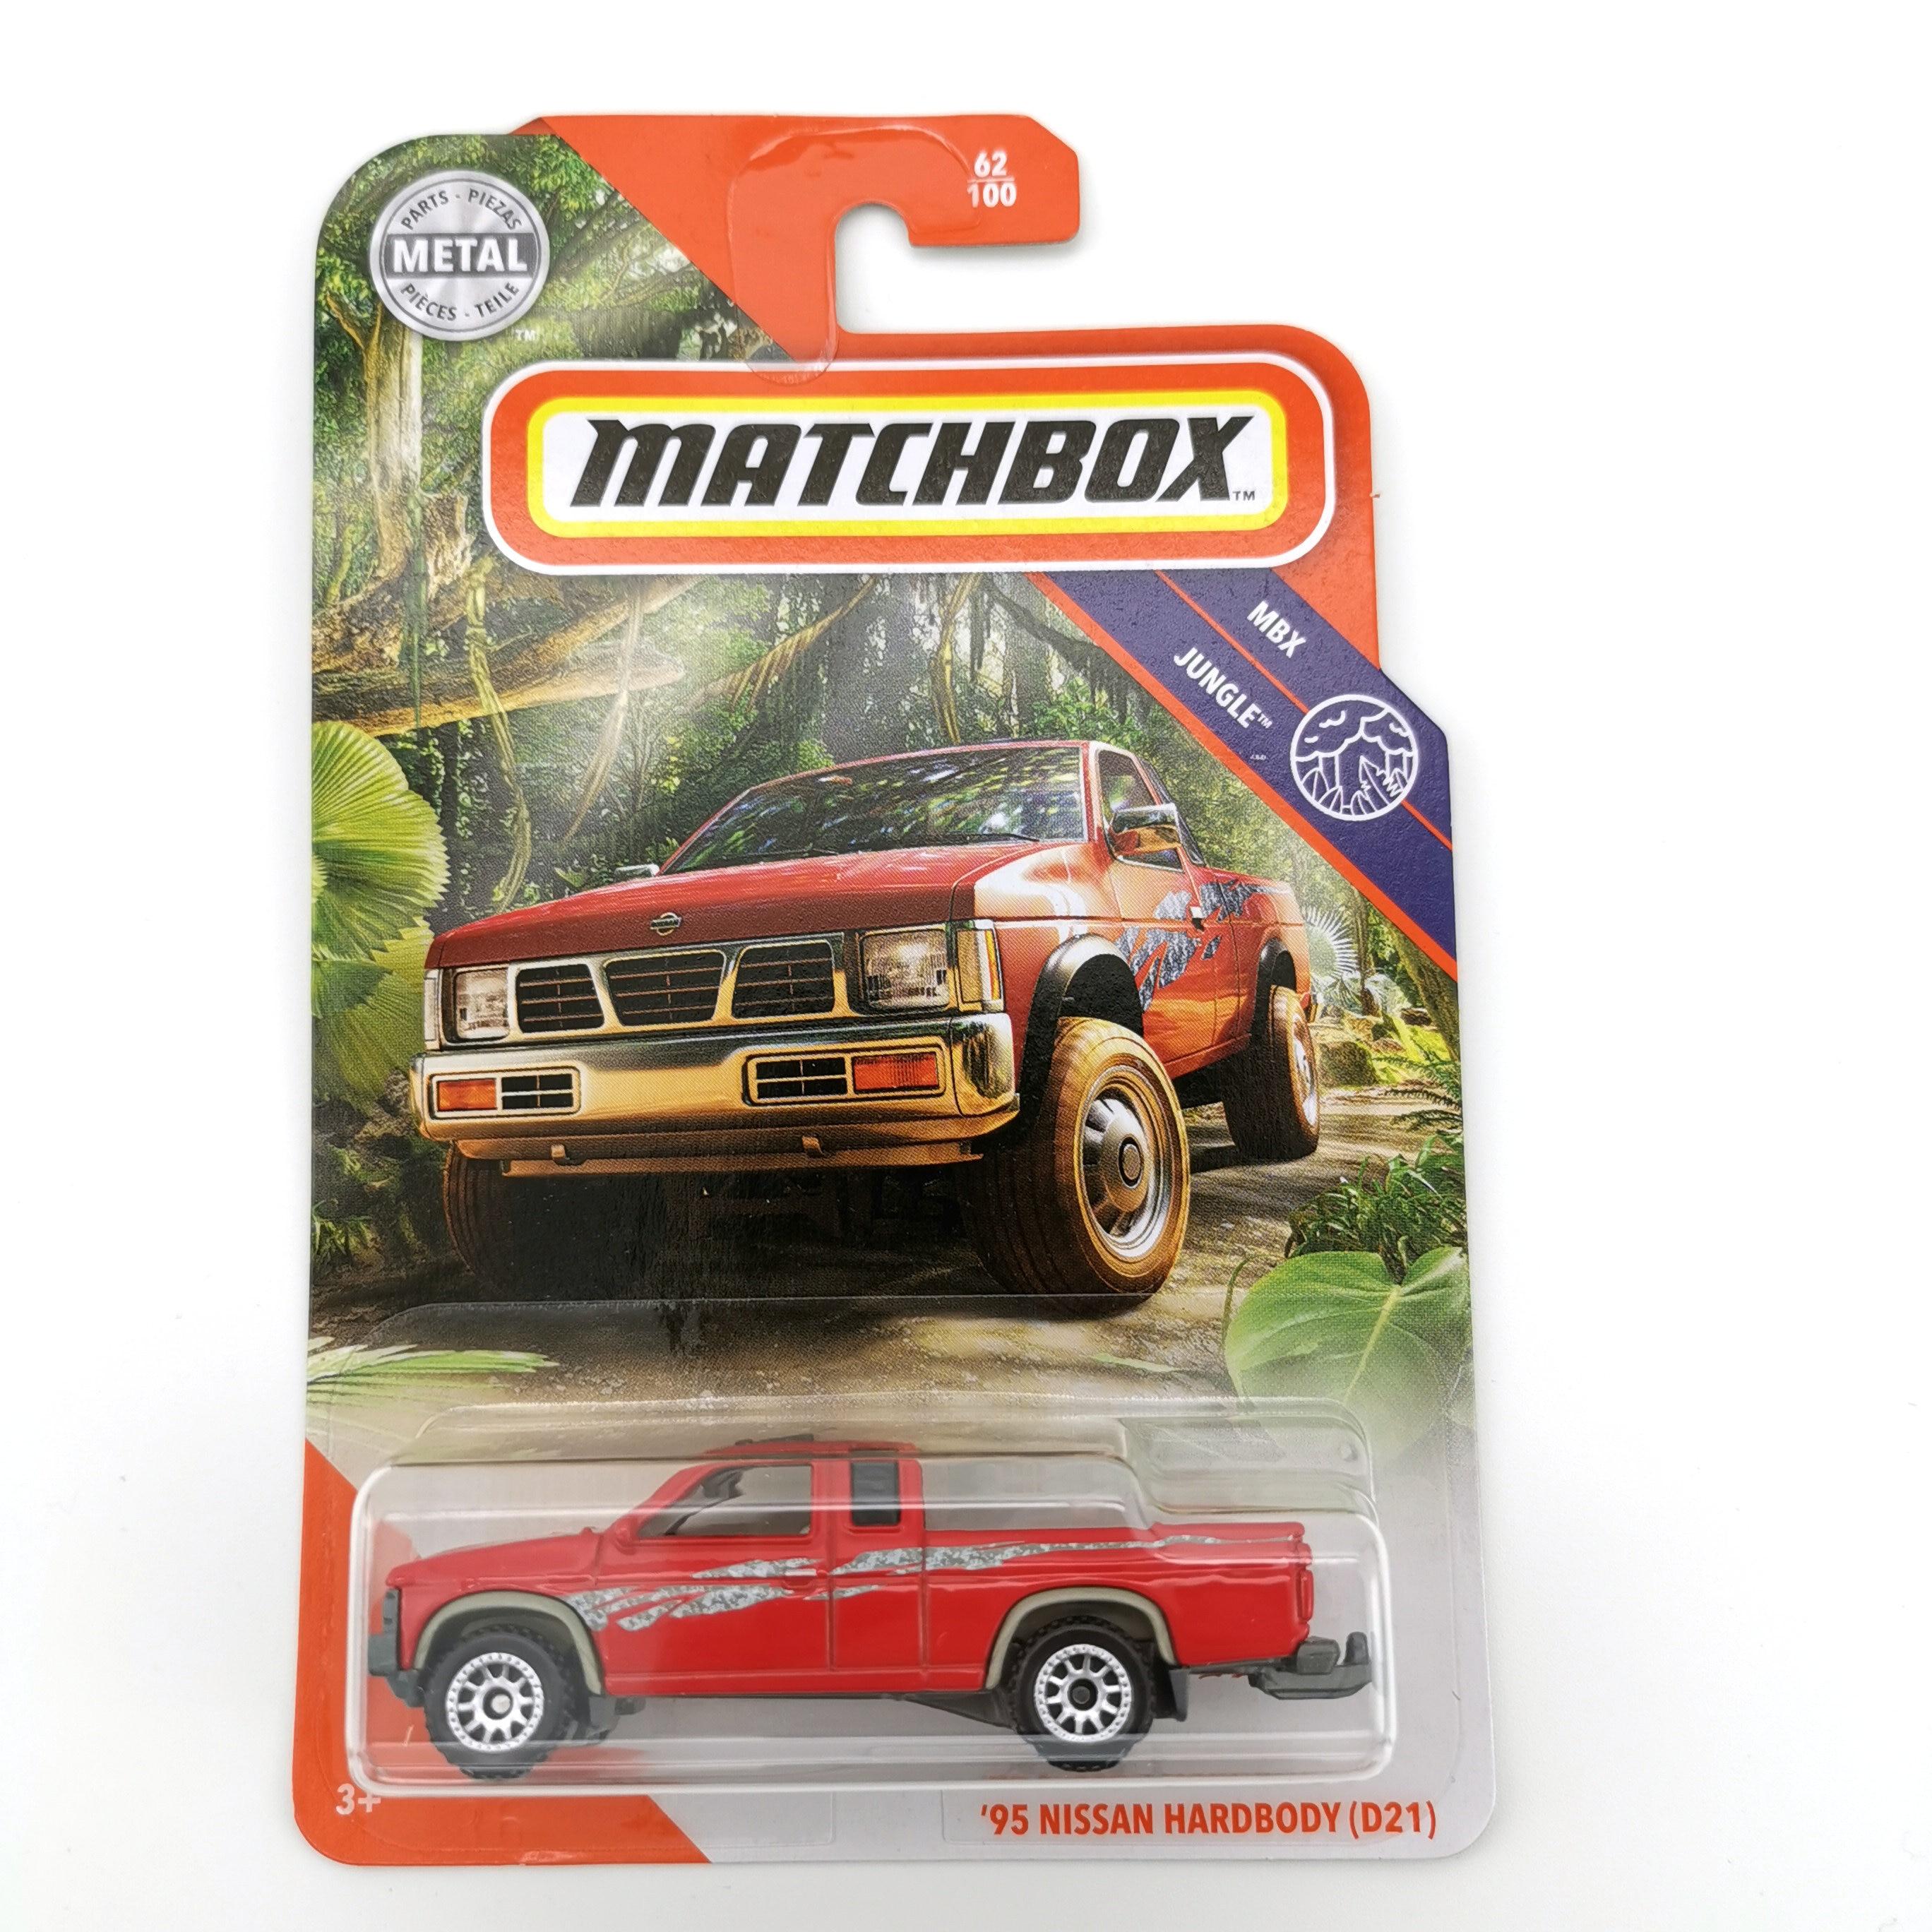 2020 Matchbox Car 1:64 Sports Car 95 NISSAN HARDBODY D21 Metal Material Body Race Car Collection Alloy Car Gift